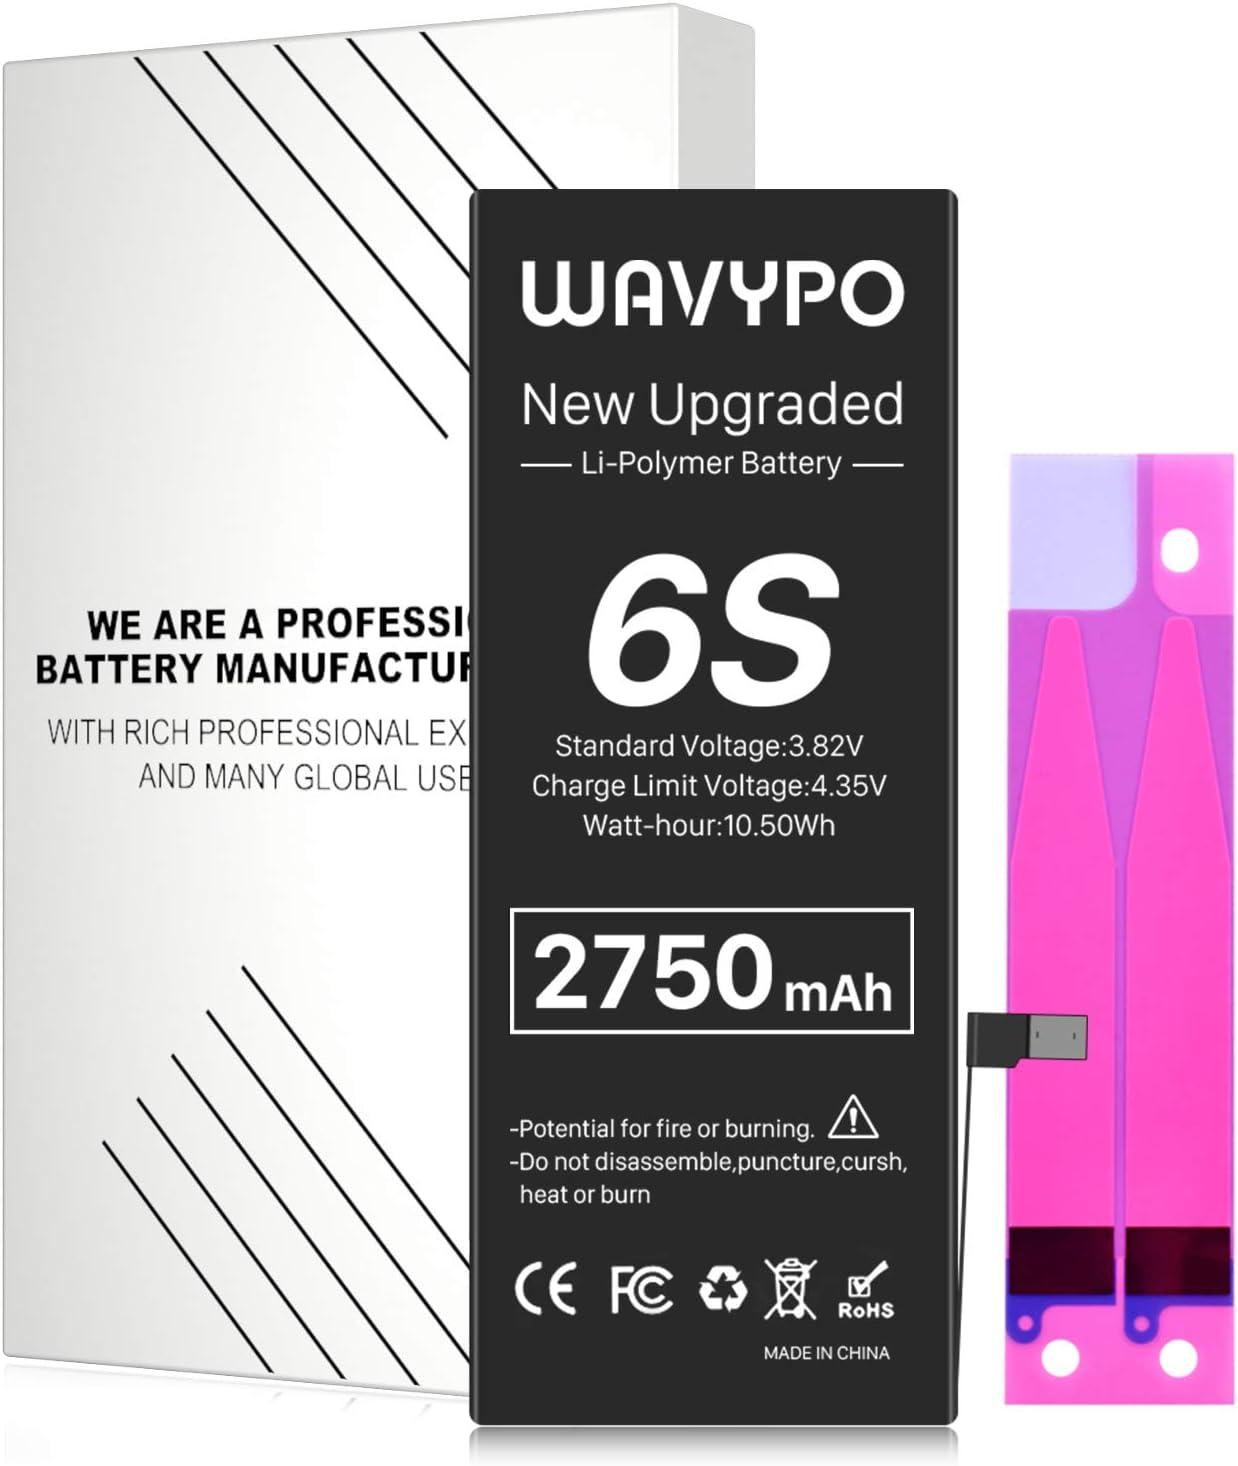 Battery for iPhone 6S, 2750mAh Wavypo High Capacity New 0 Cycle Battery Replacement for iPhone 6S A1633 A1688 A1700 and Instruction